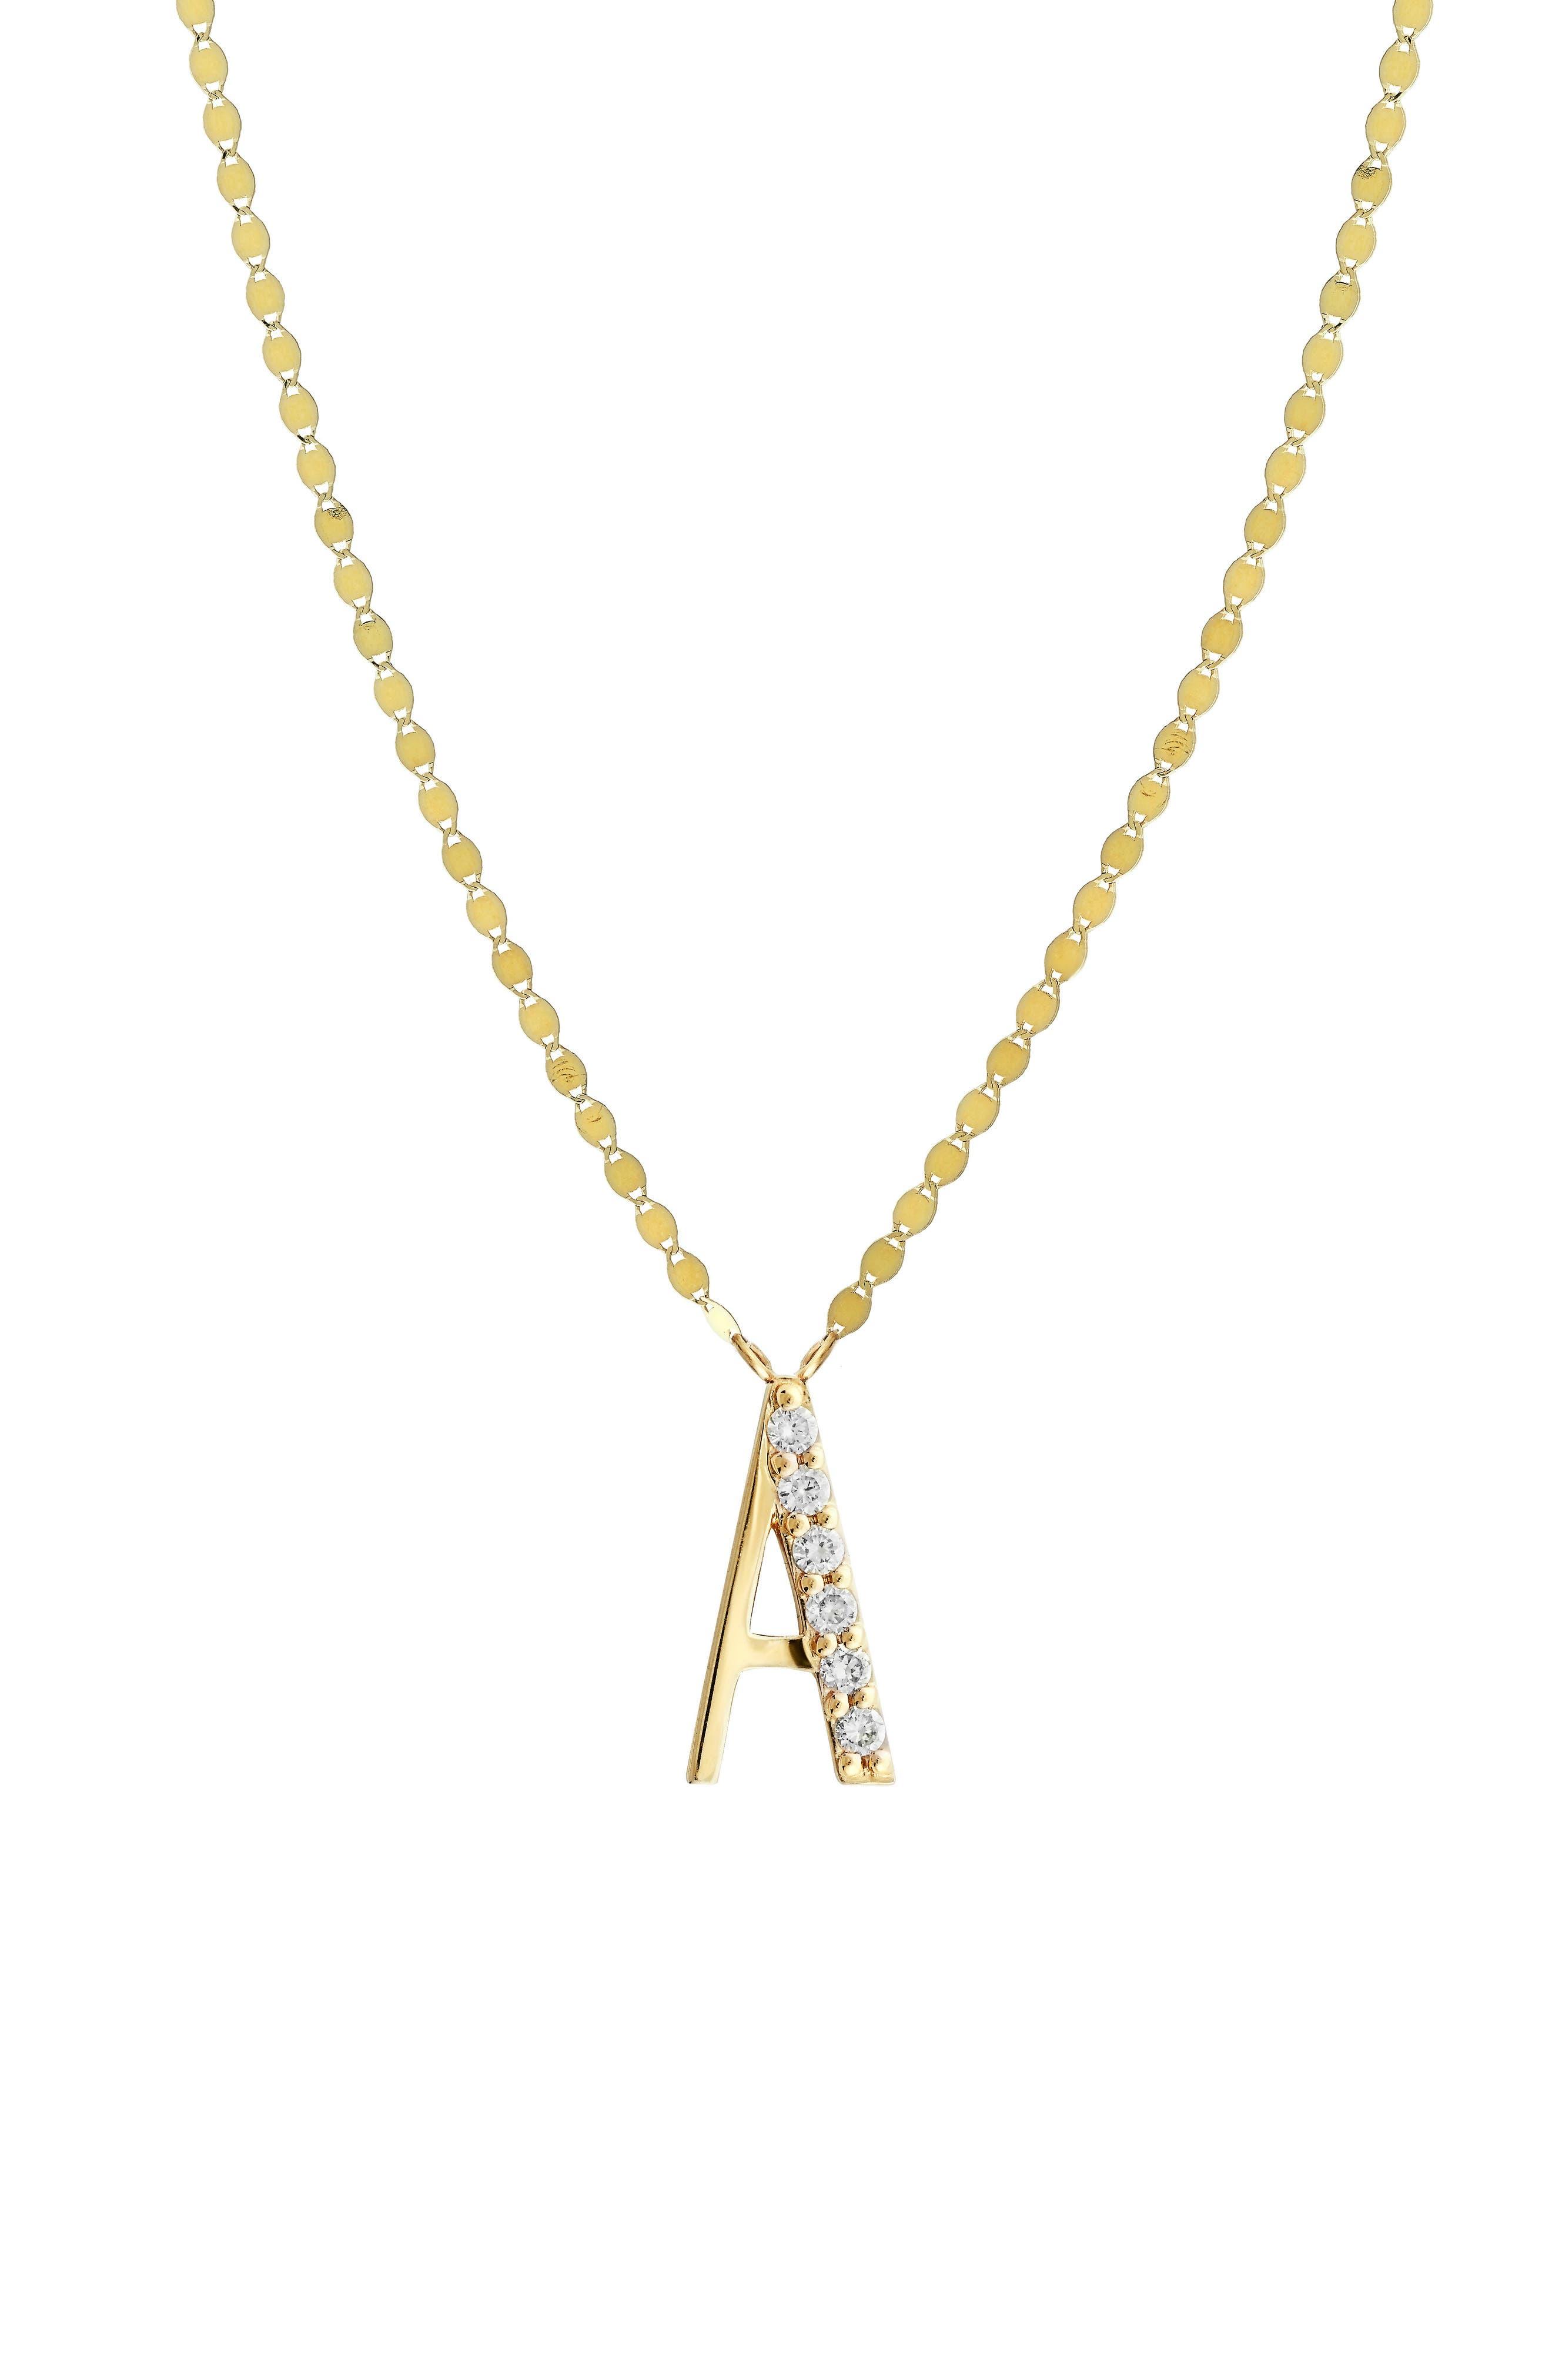 Main Image - Lana Jewelry Initial Pendant Necklace